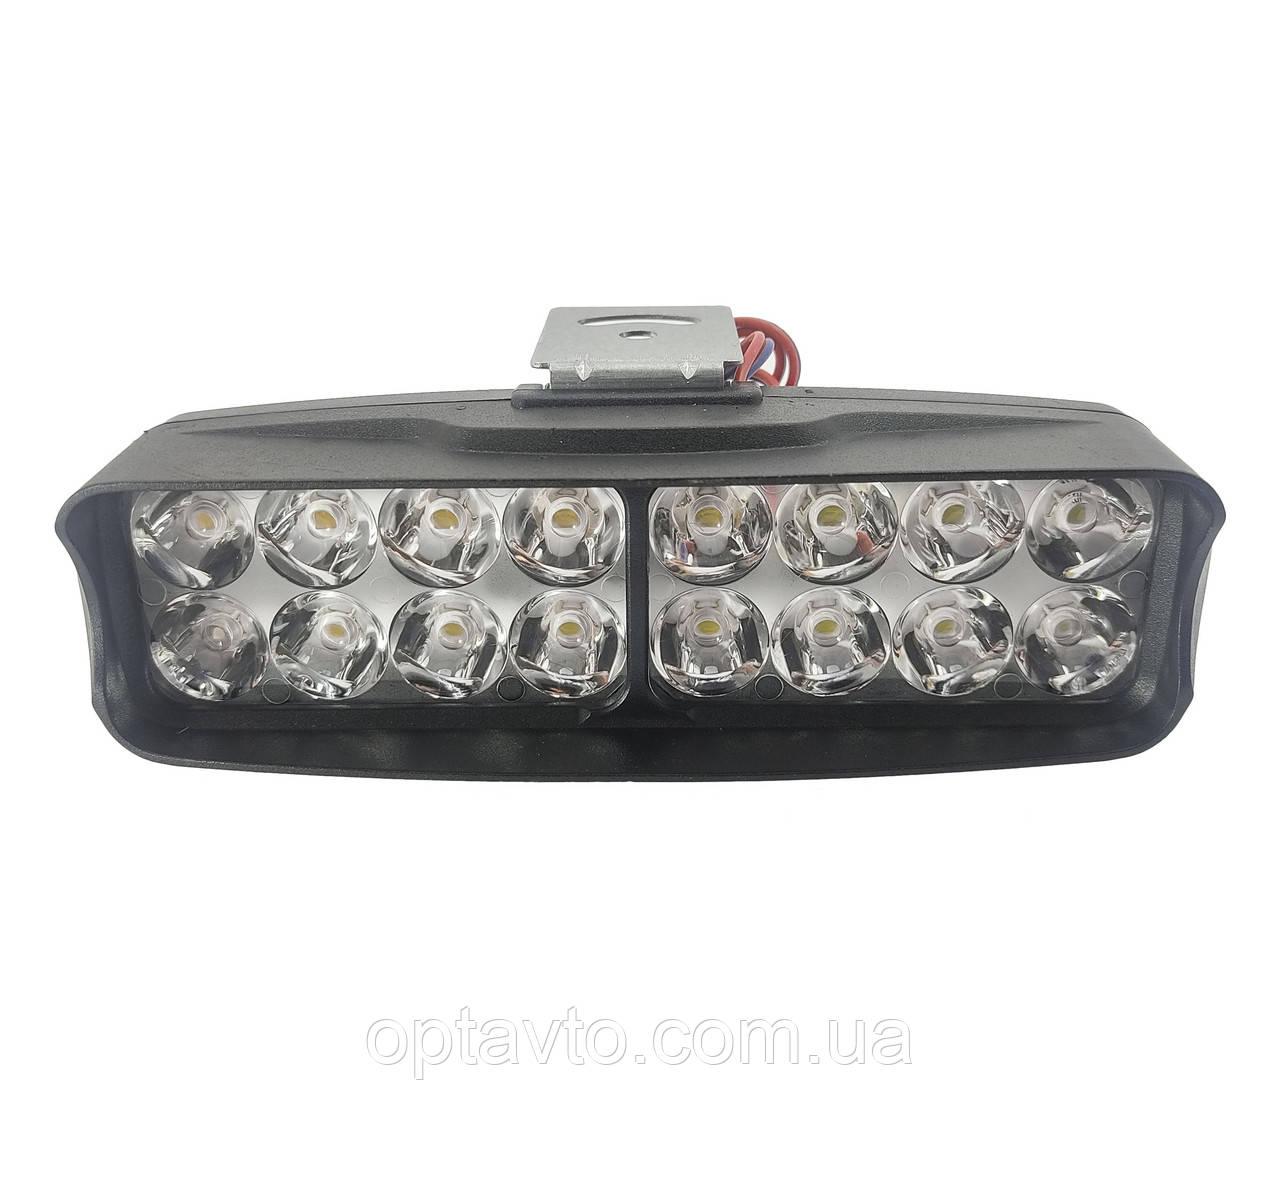 LED фара 24W 12-24 Вольт. Светодиодная лэд фара 16 диодов L-23.